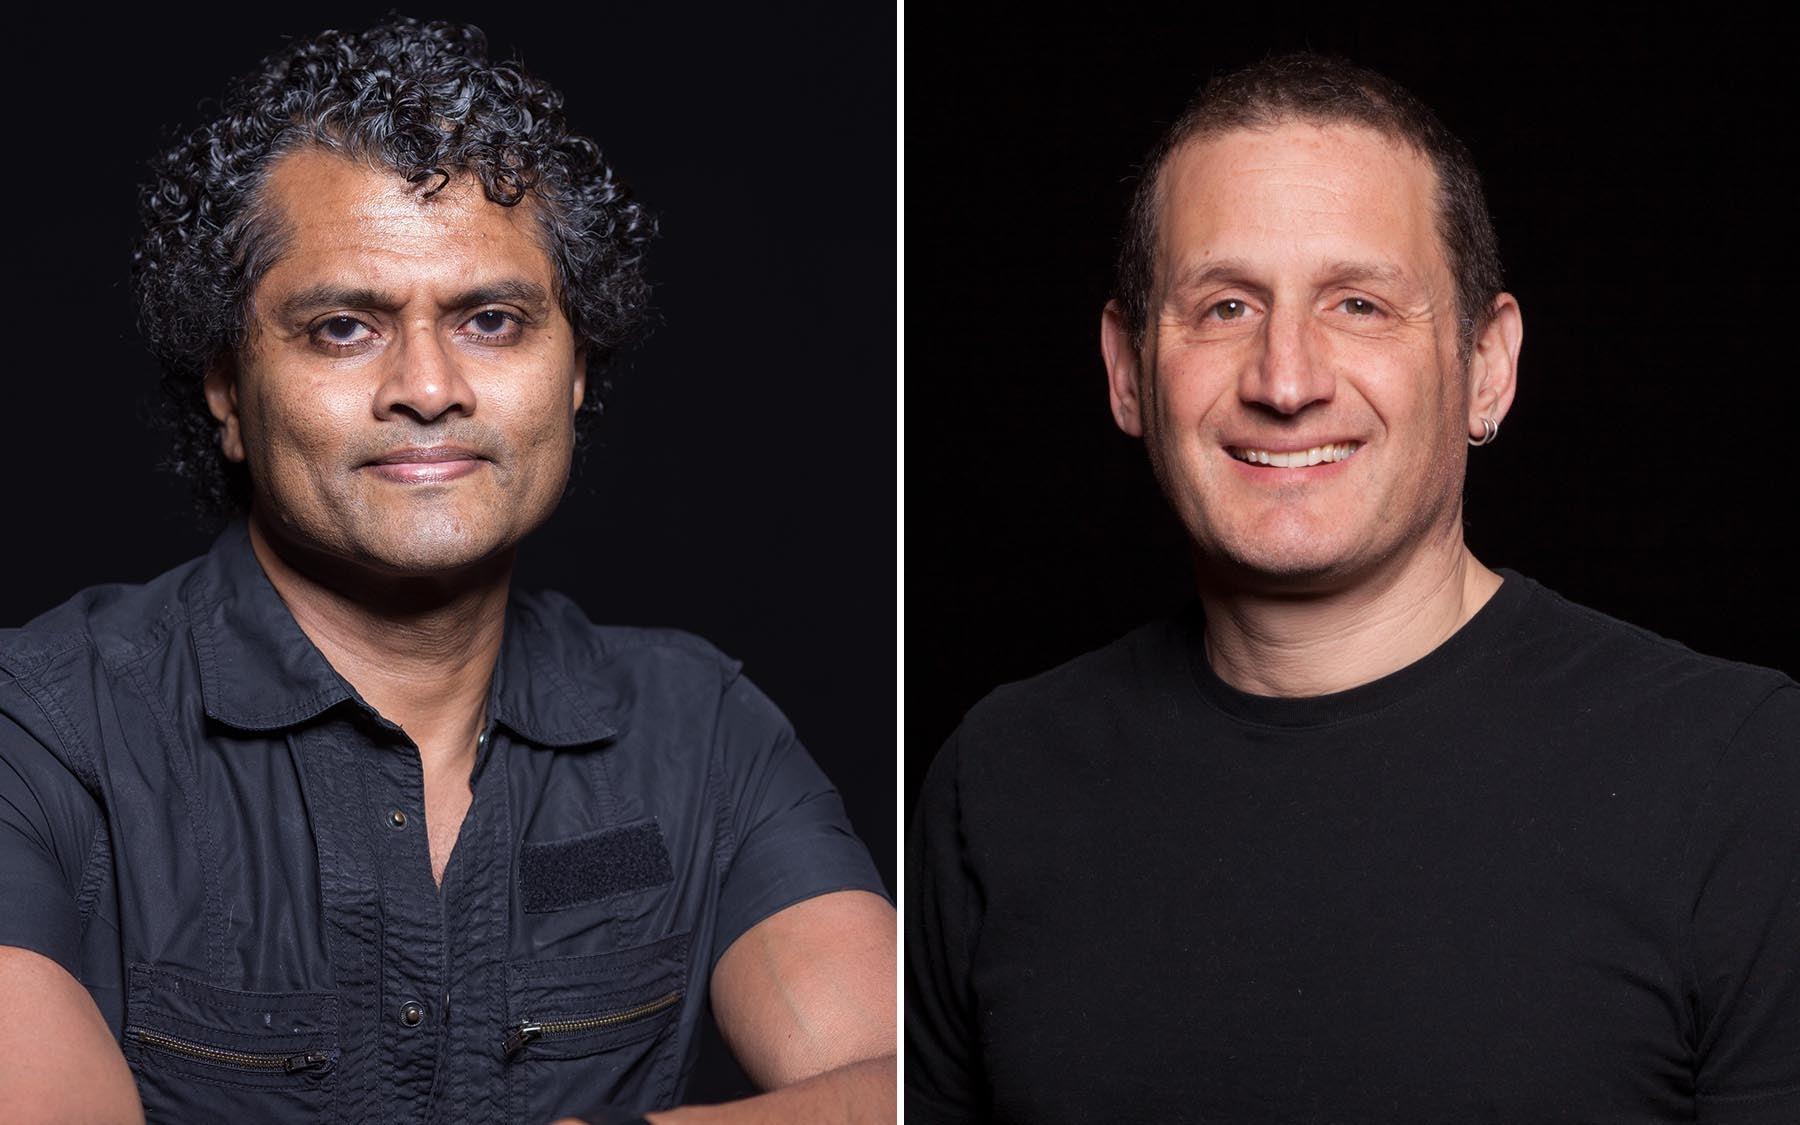 Partha Mitra and Josh Dubau